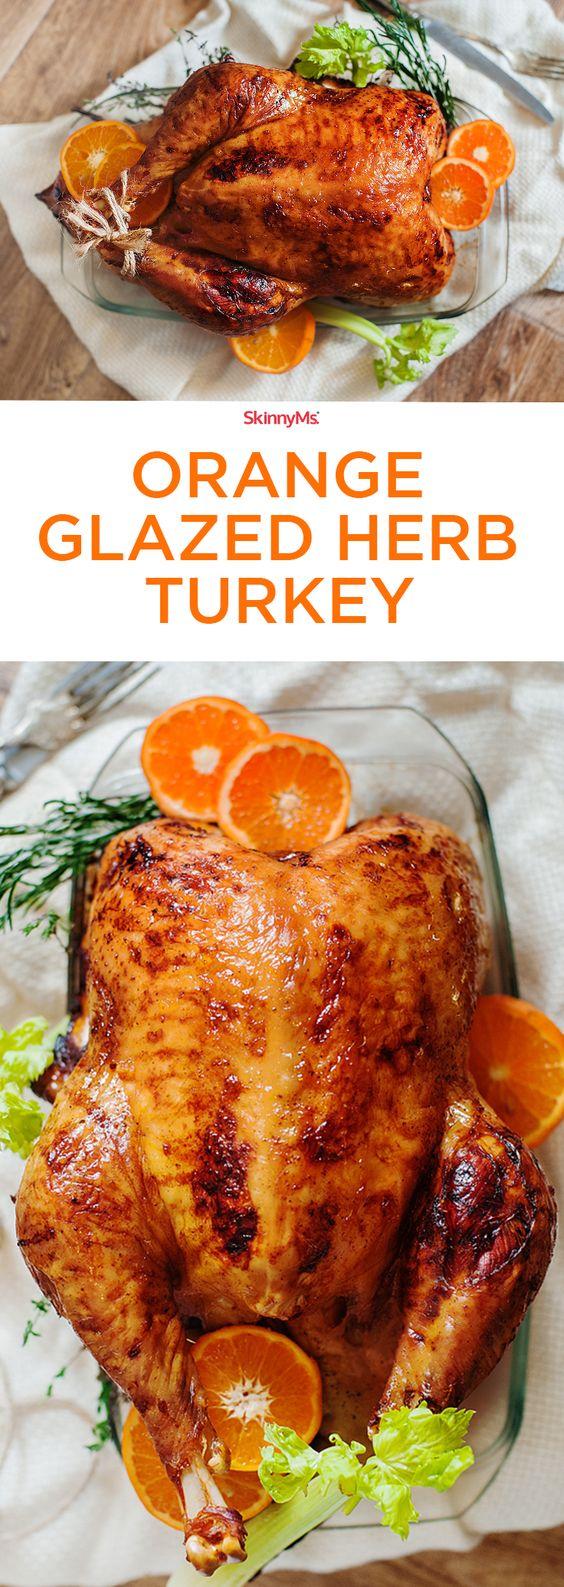 Thanksgiving turkey recipes: Orange Glazed Herb Turkey